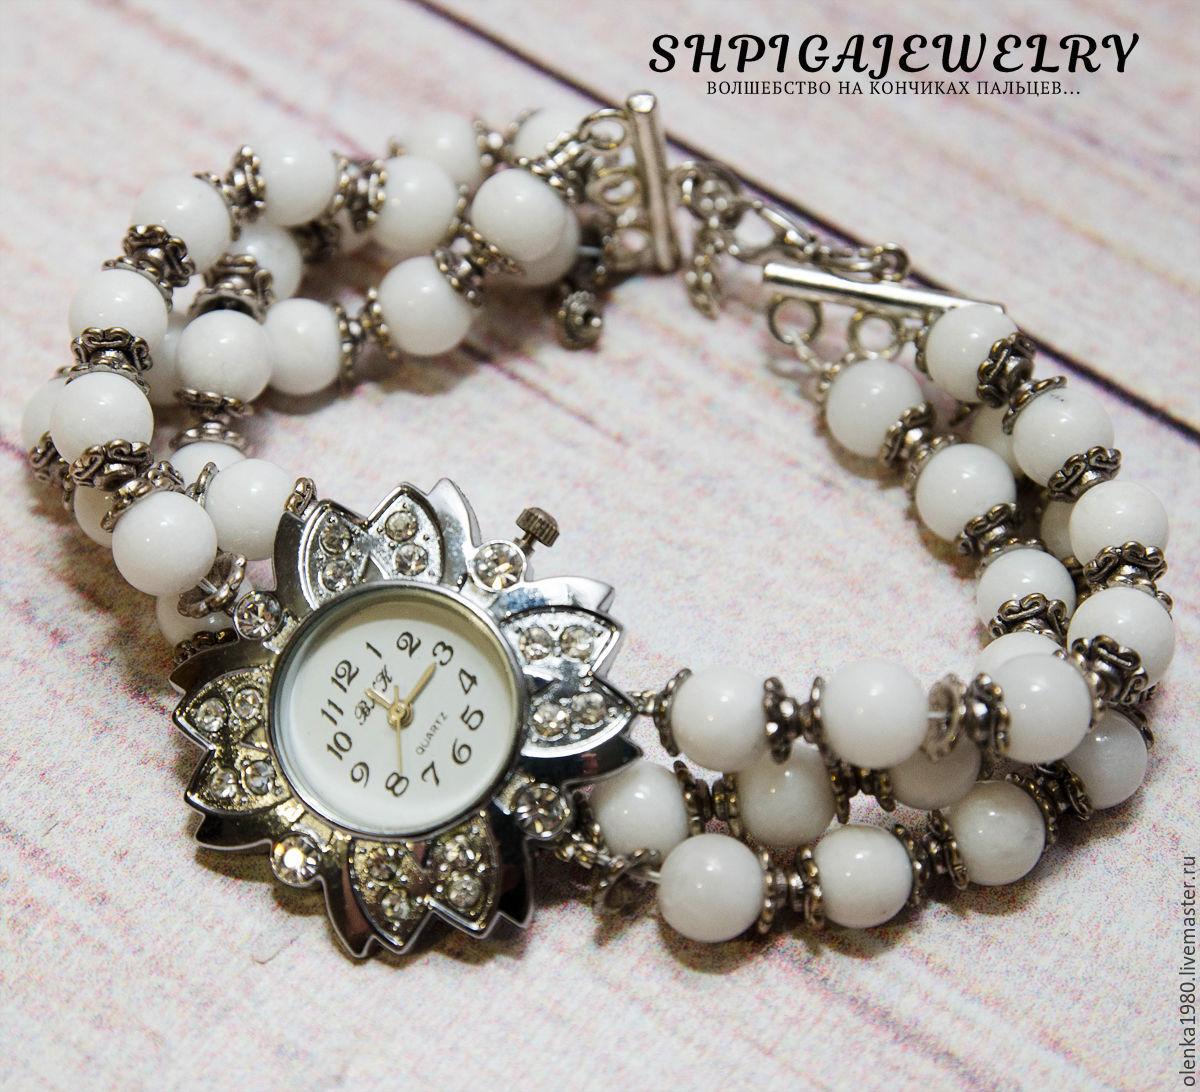 Watches `Lily`, white, women's three-row bracelet of jadeite